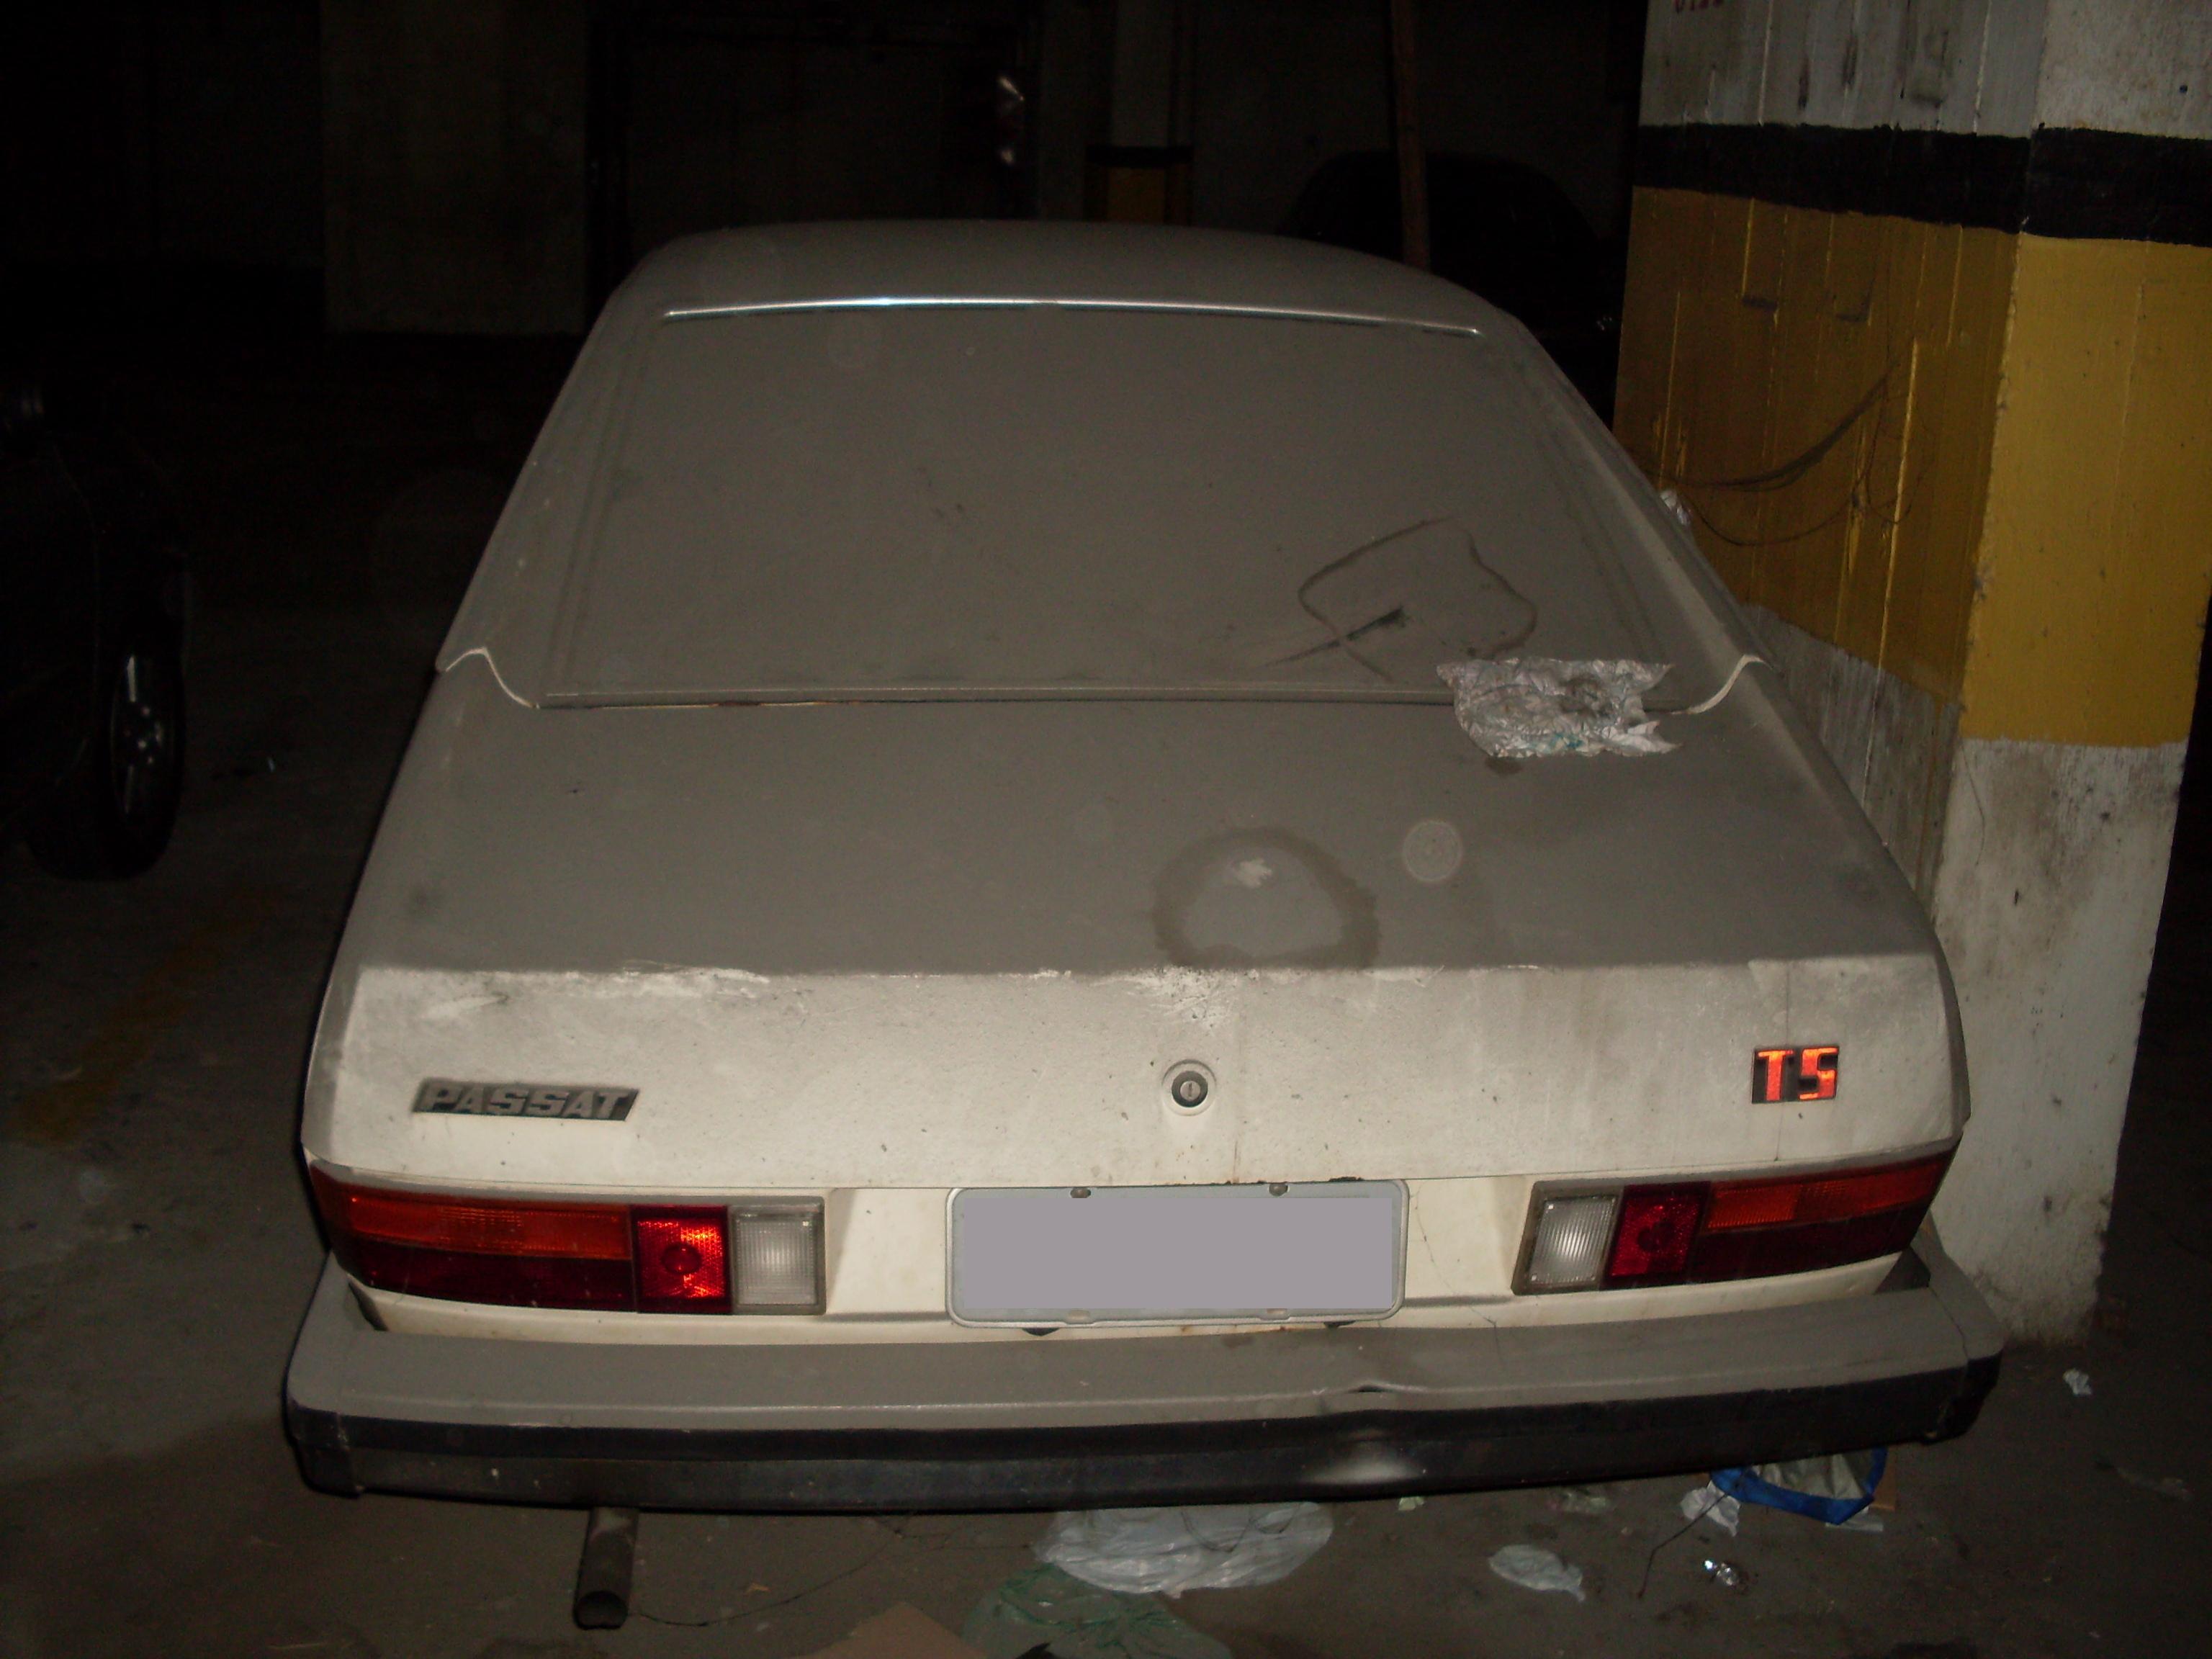 sdc10096 VW Passat, dois de uma vez!